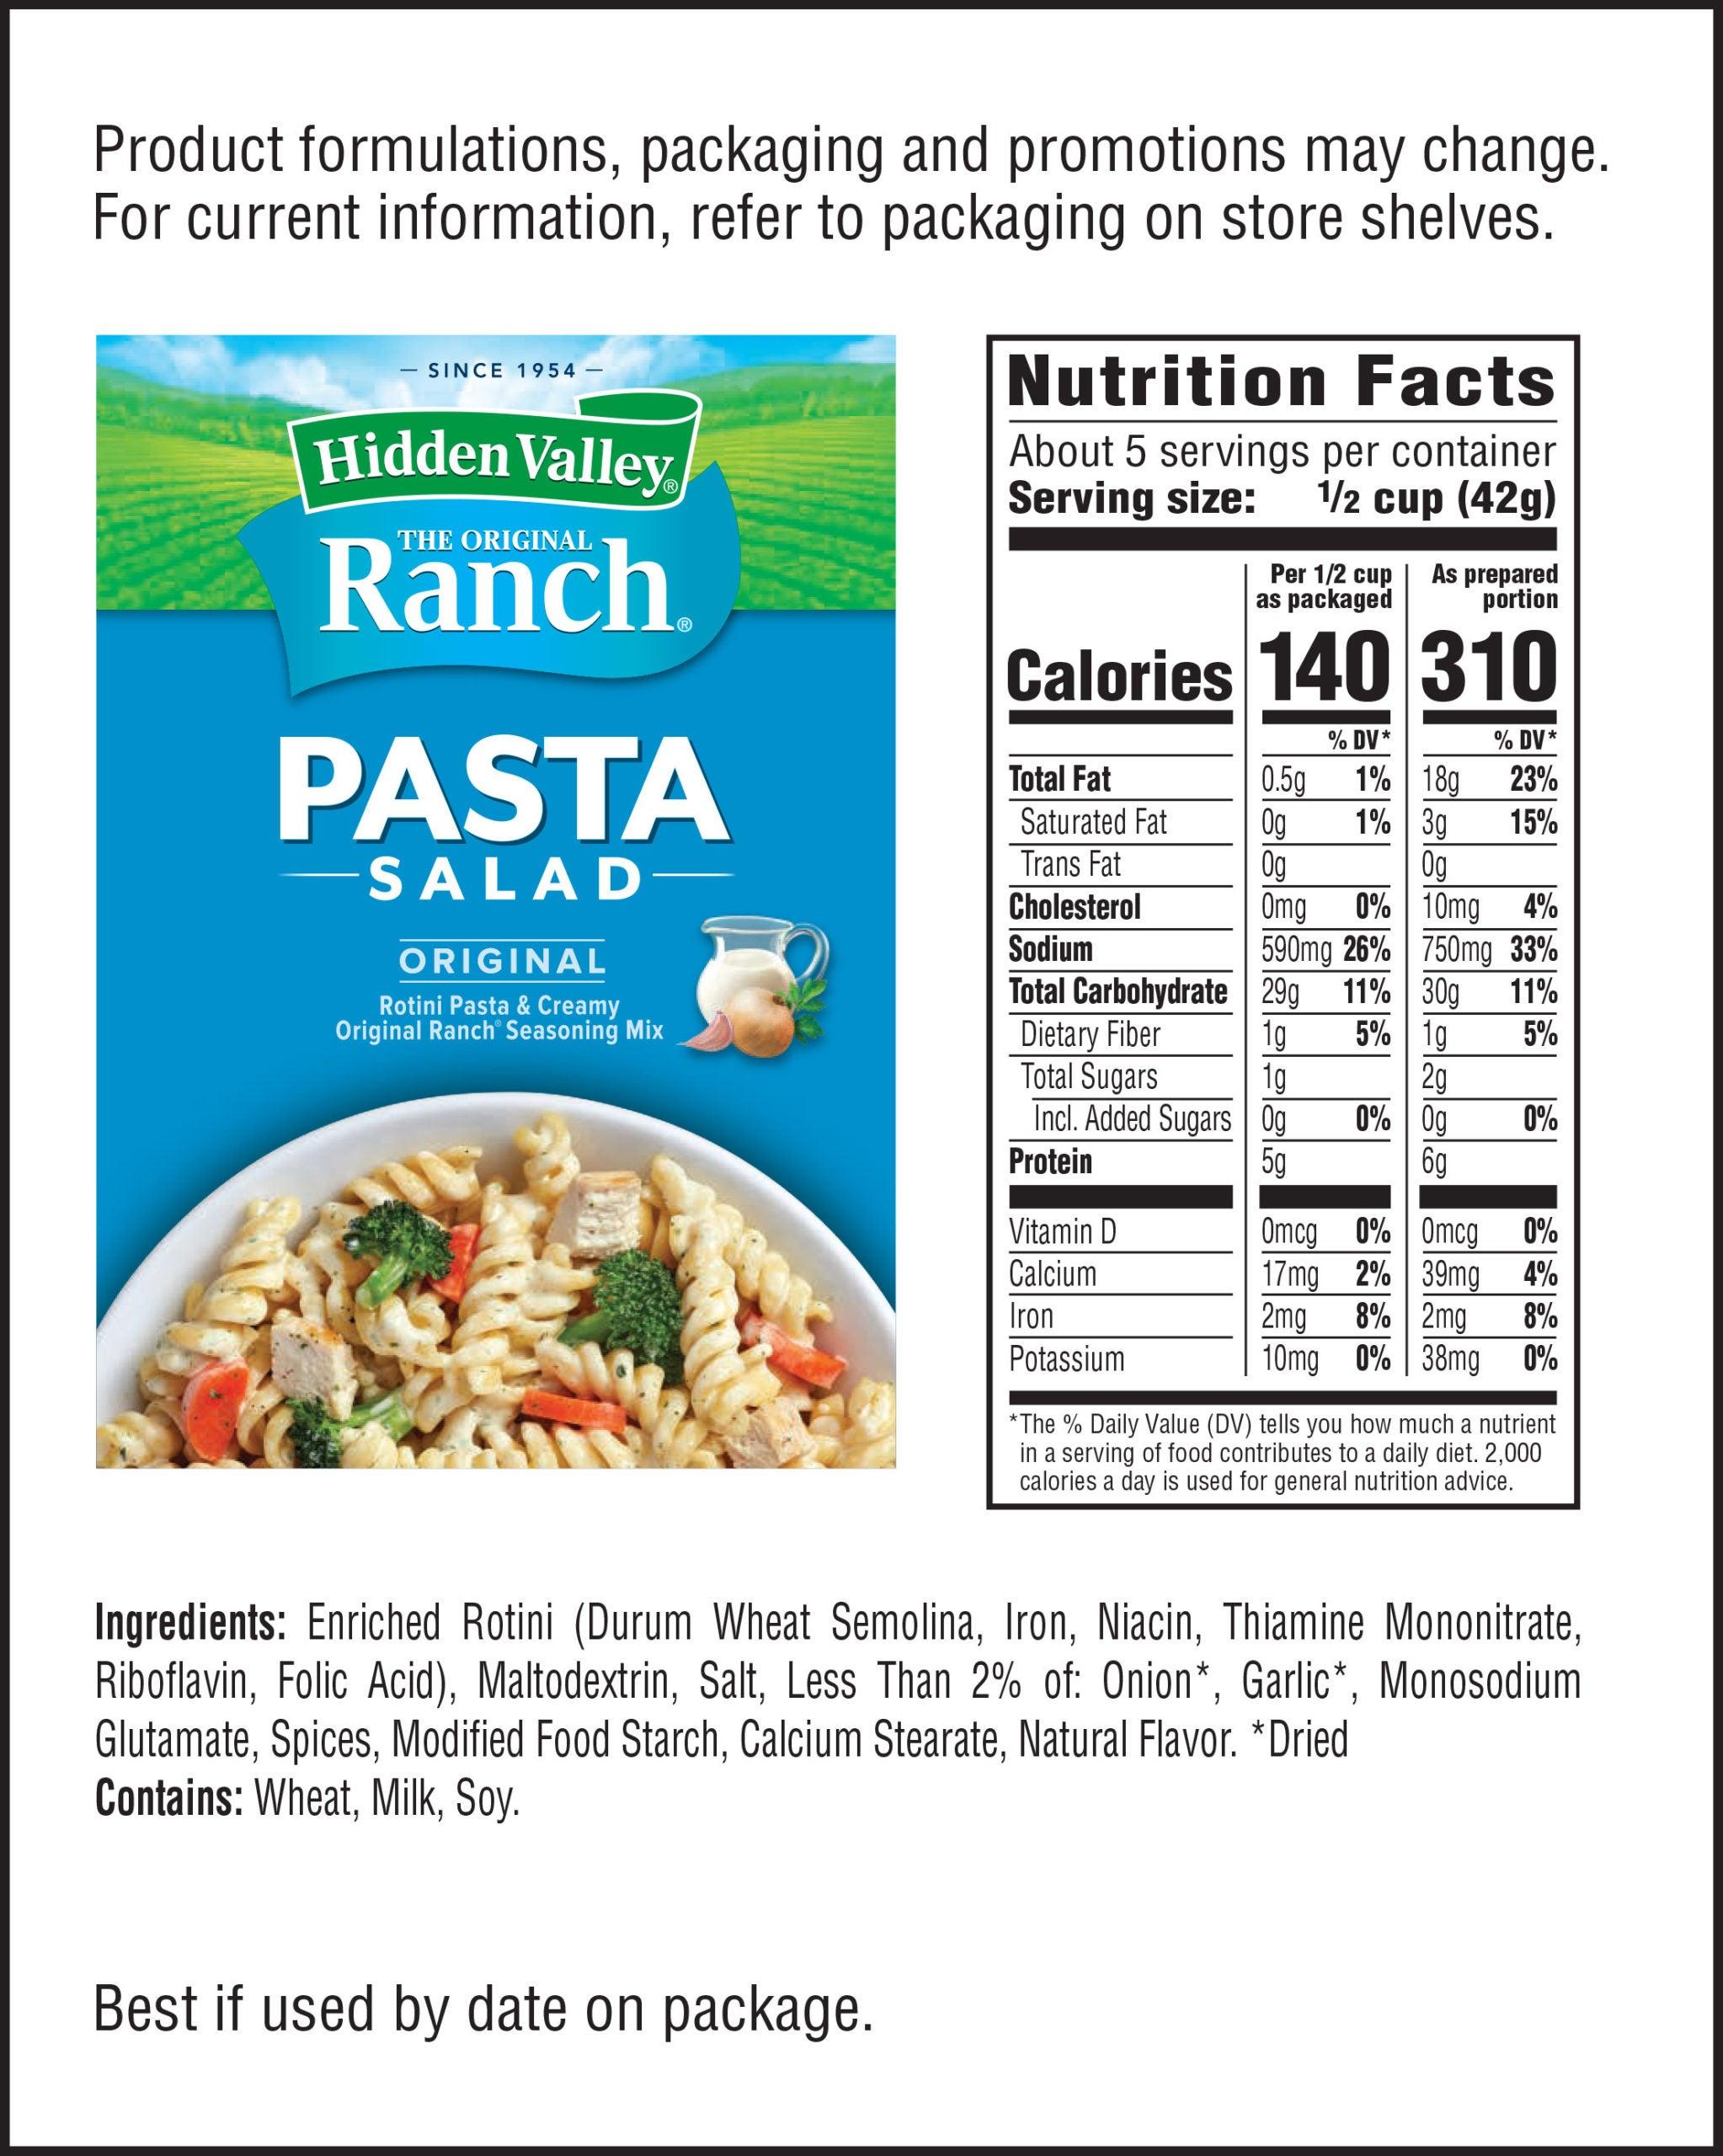 Hidden Valley® Original Ranch® Pasta Salad nutritional facts